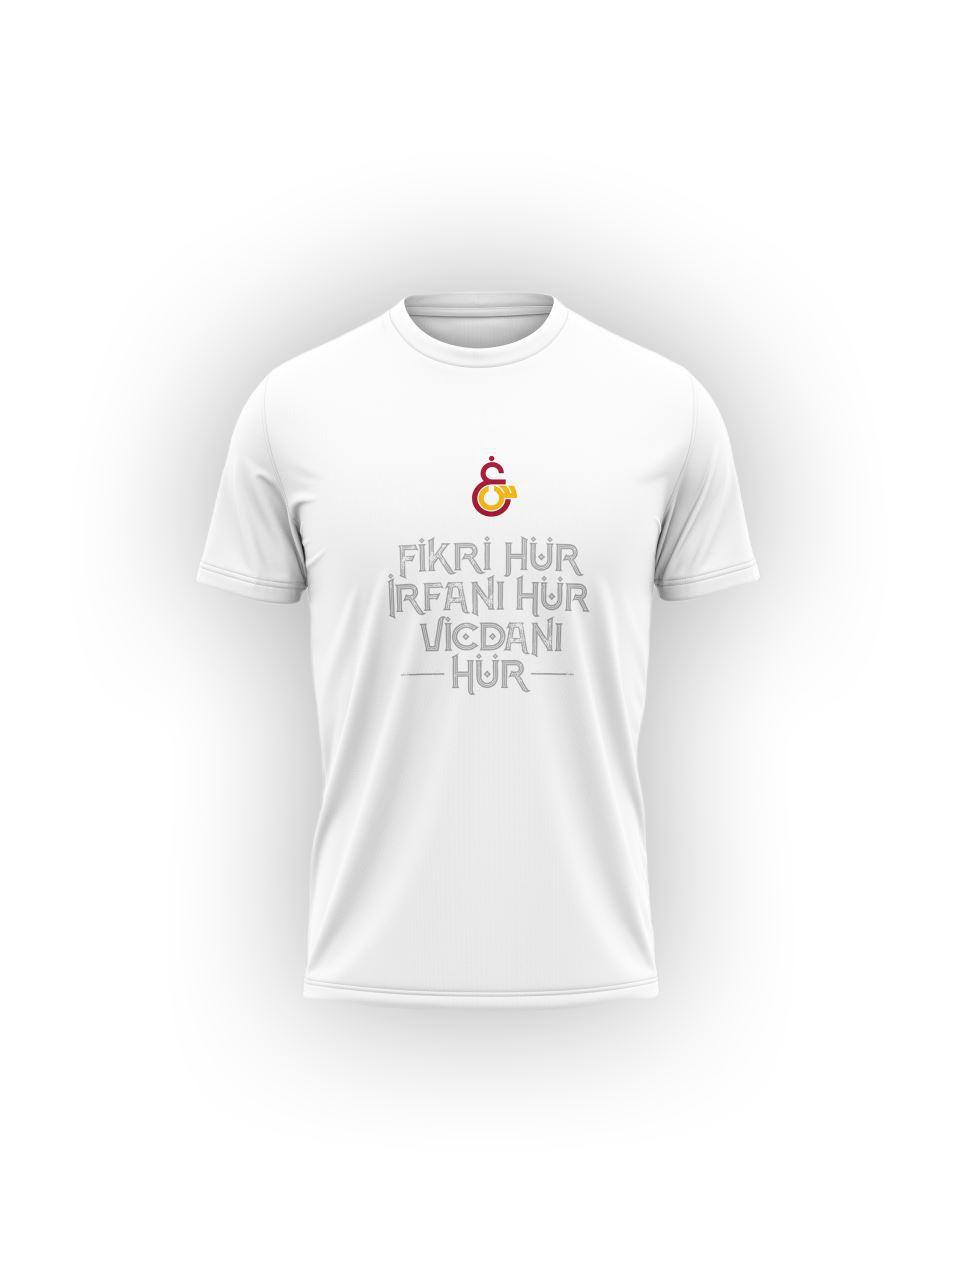 Galatasaray Fikri Hür Erkek T-shirt E211703